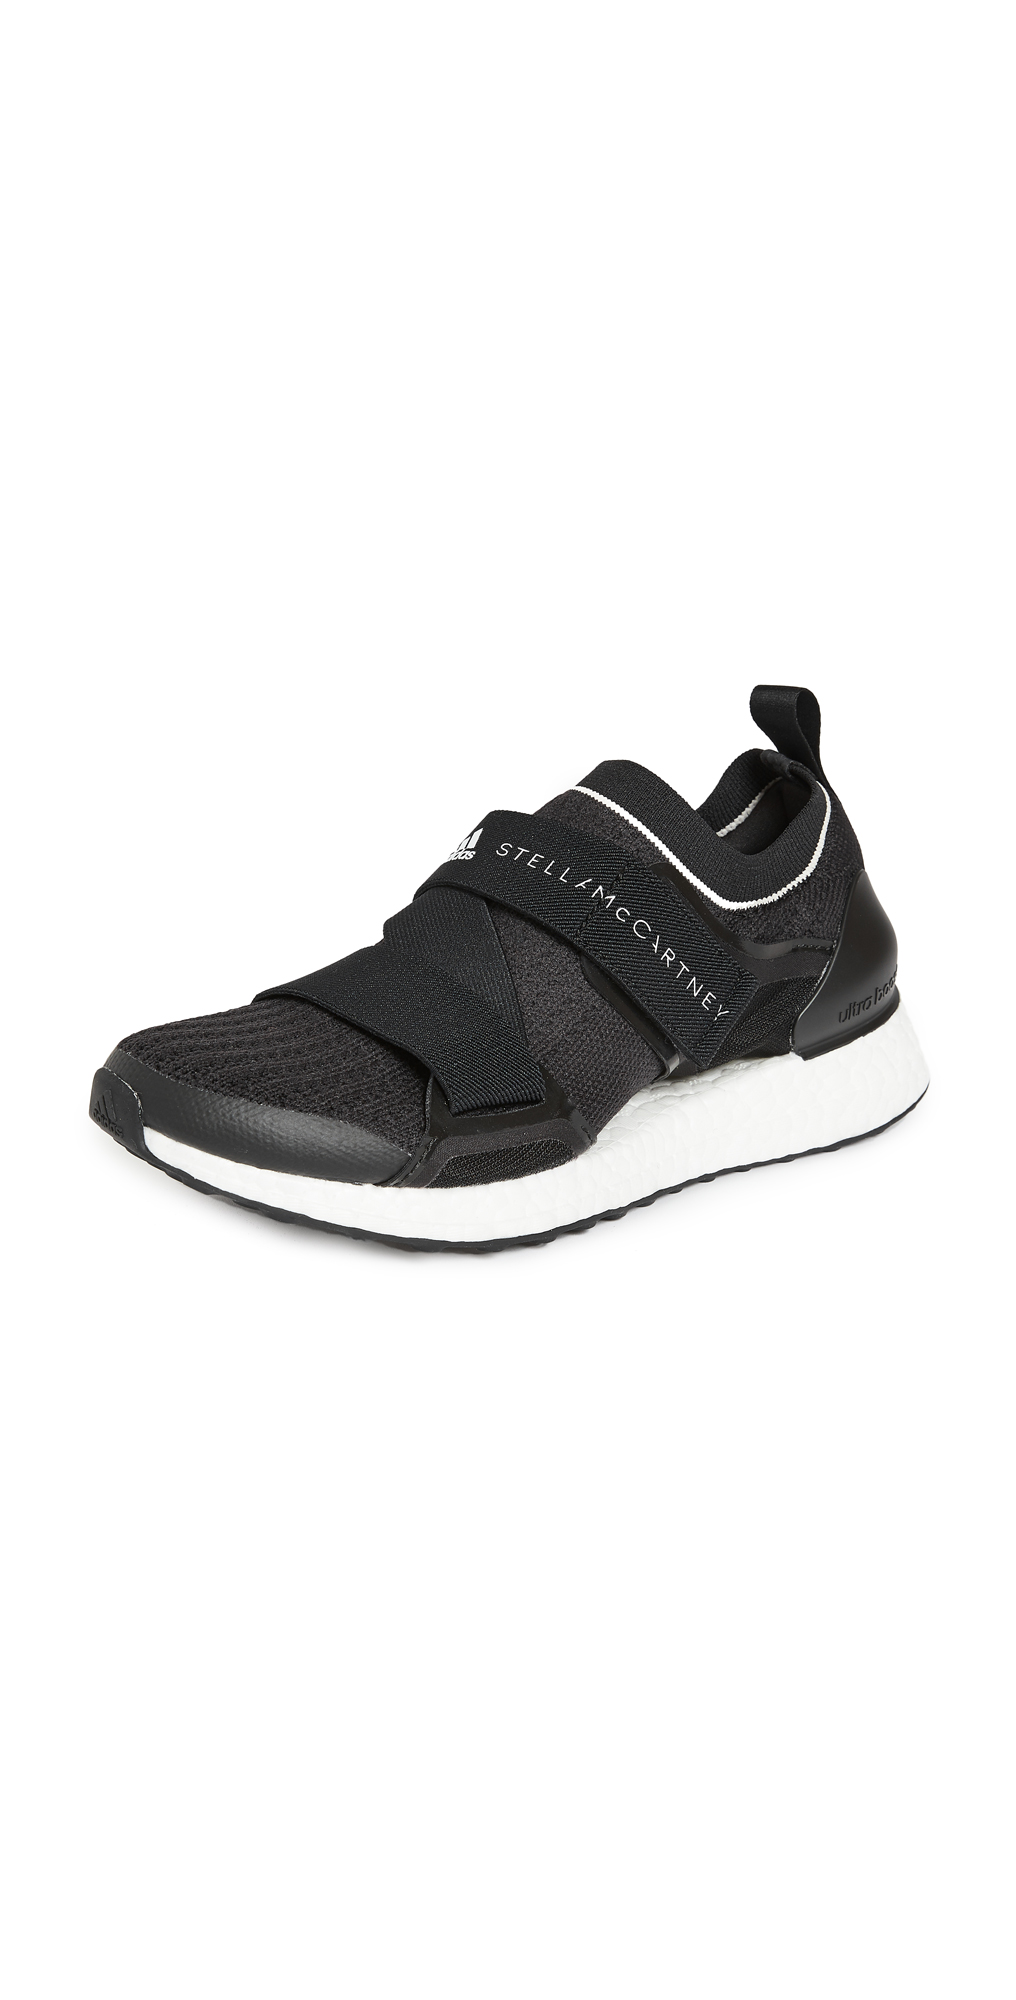 adidas by Stella McCartney Asmc Ultraboost X Sneakers